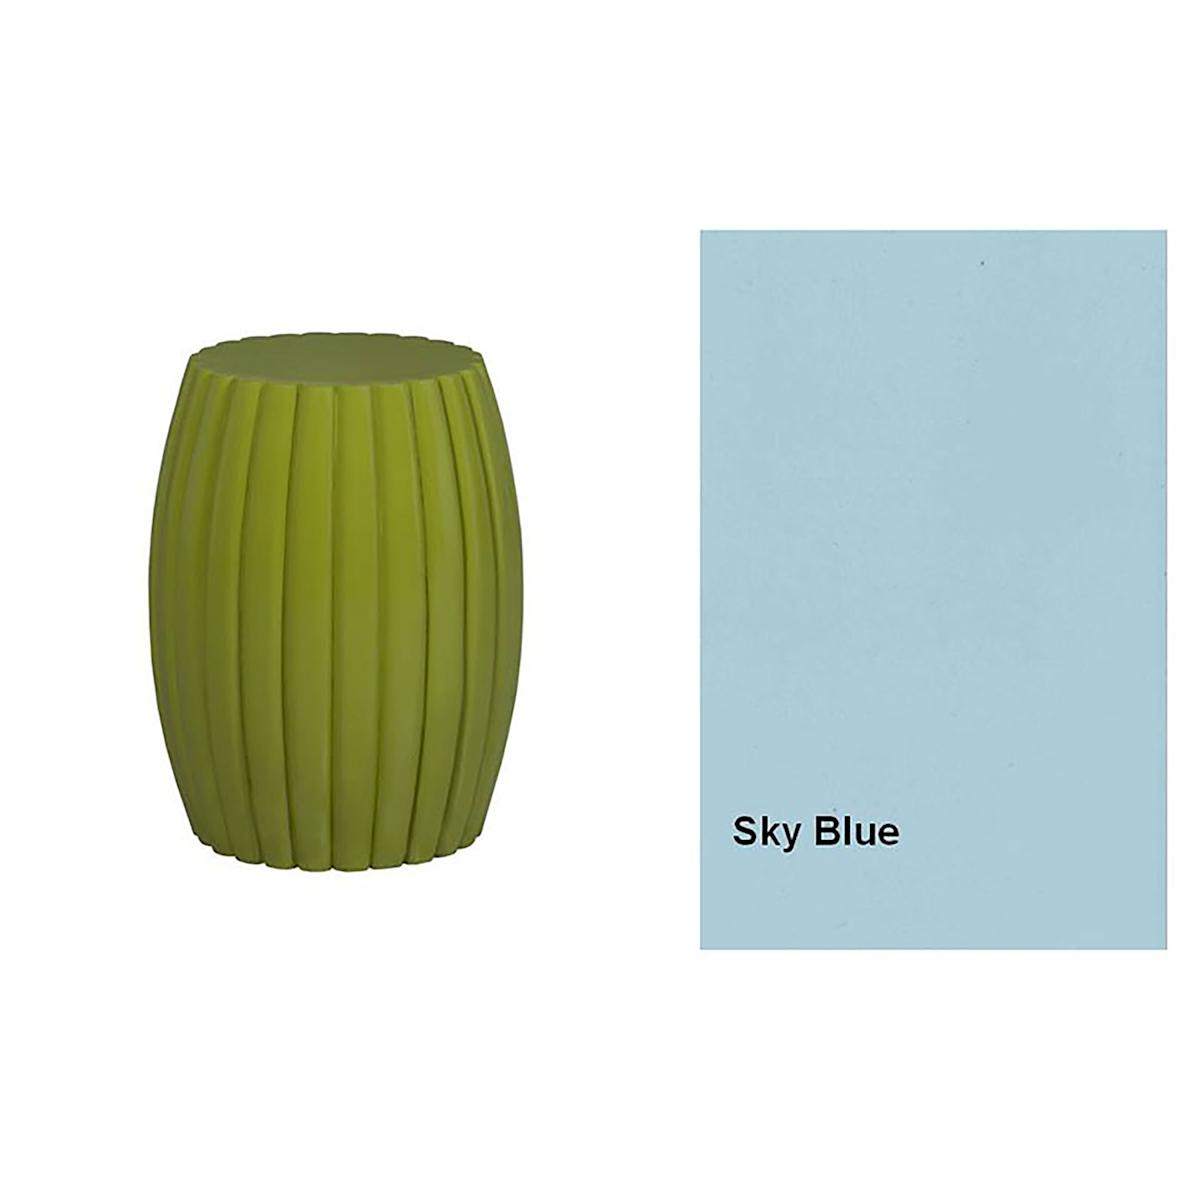 Grooved Drum Stool/Table A24712822-SK | ELK Home